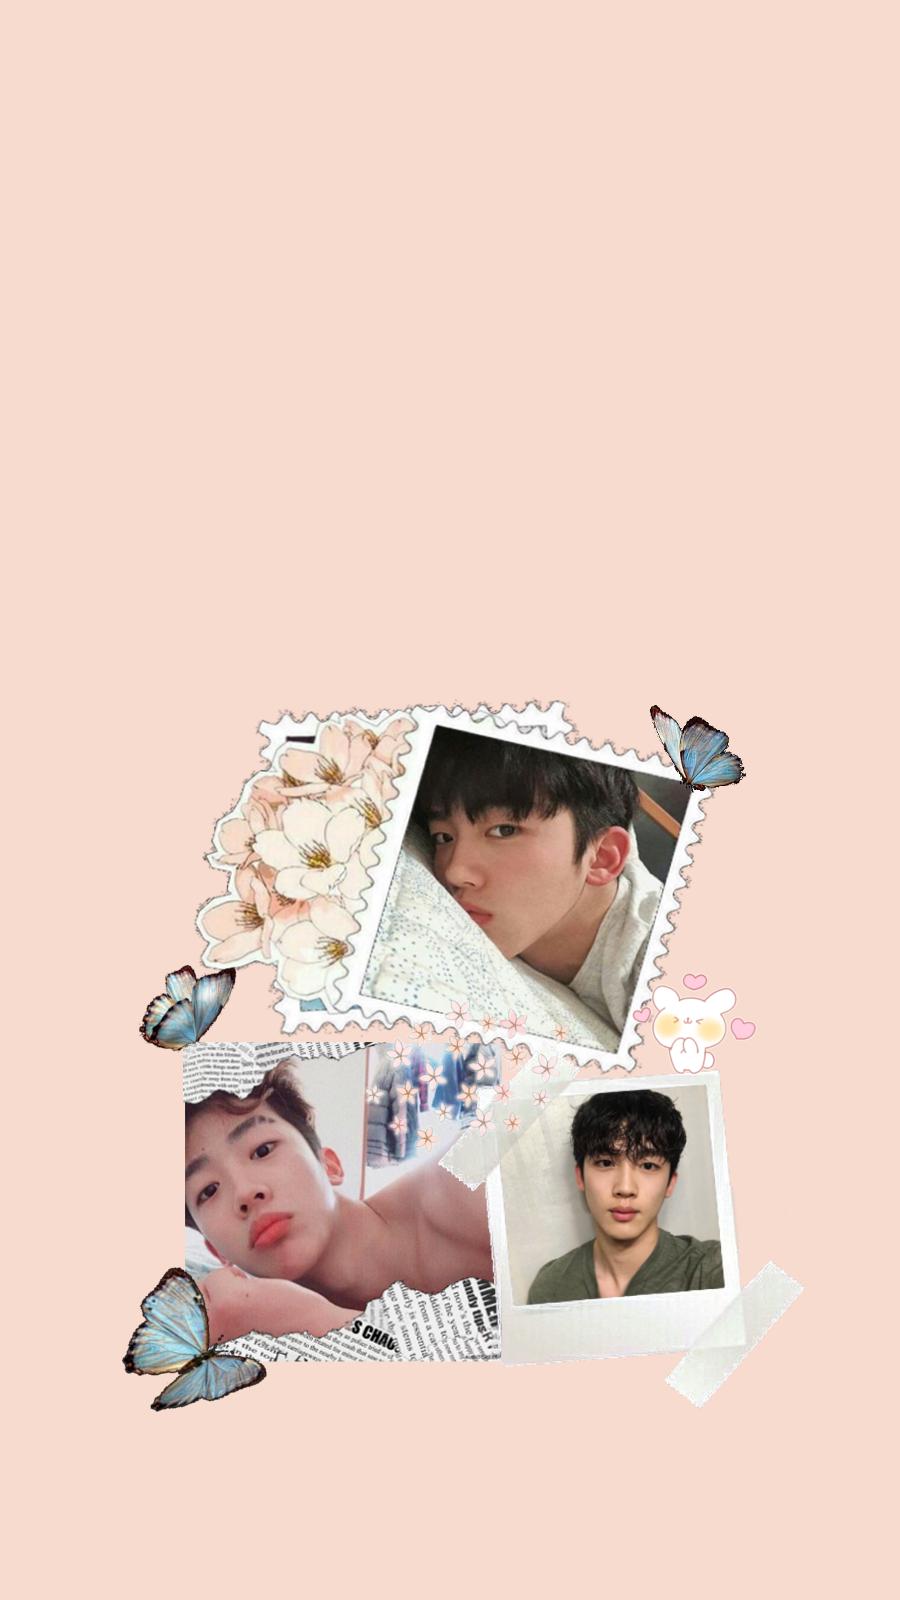 X1 Kim Yohan Phone Wallpaper Lockscreen Made By Me Feel